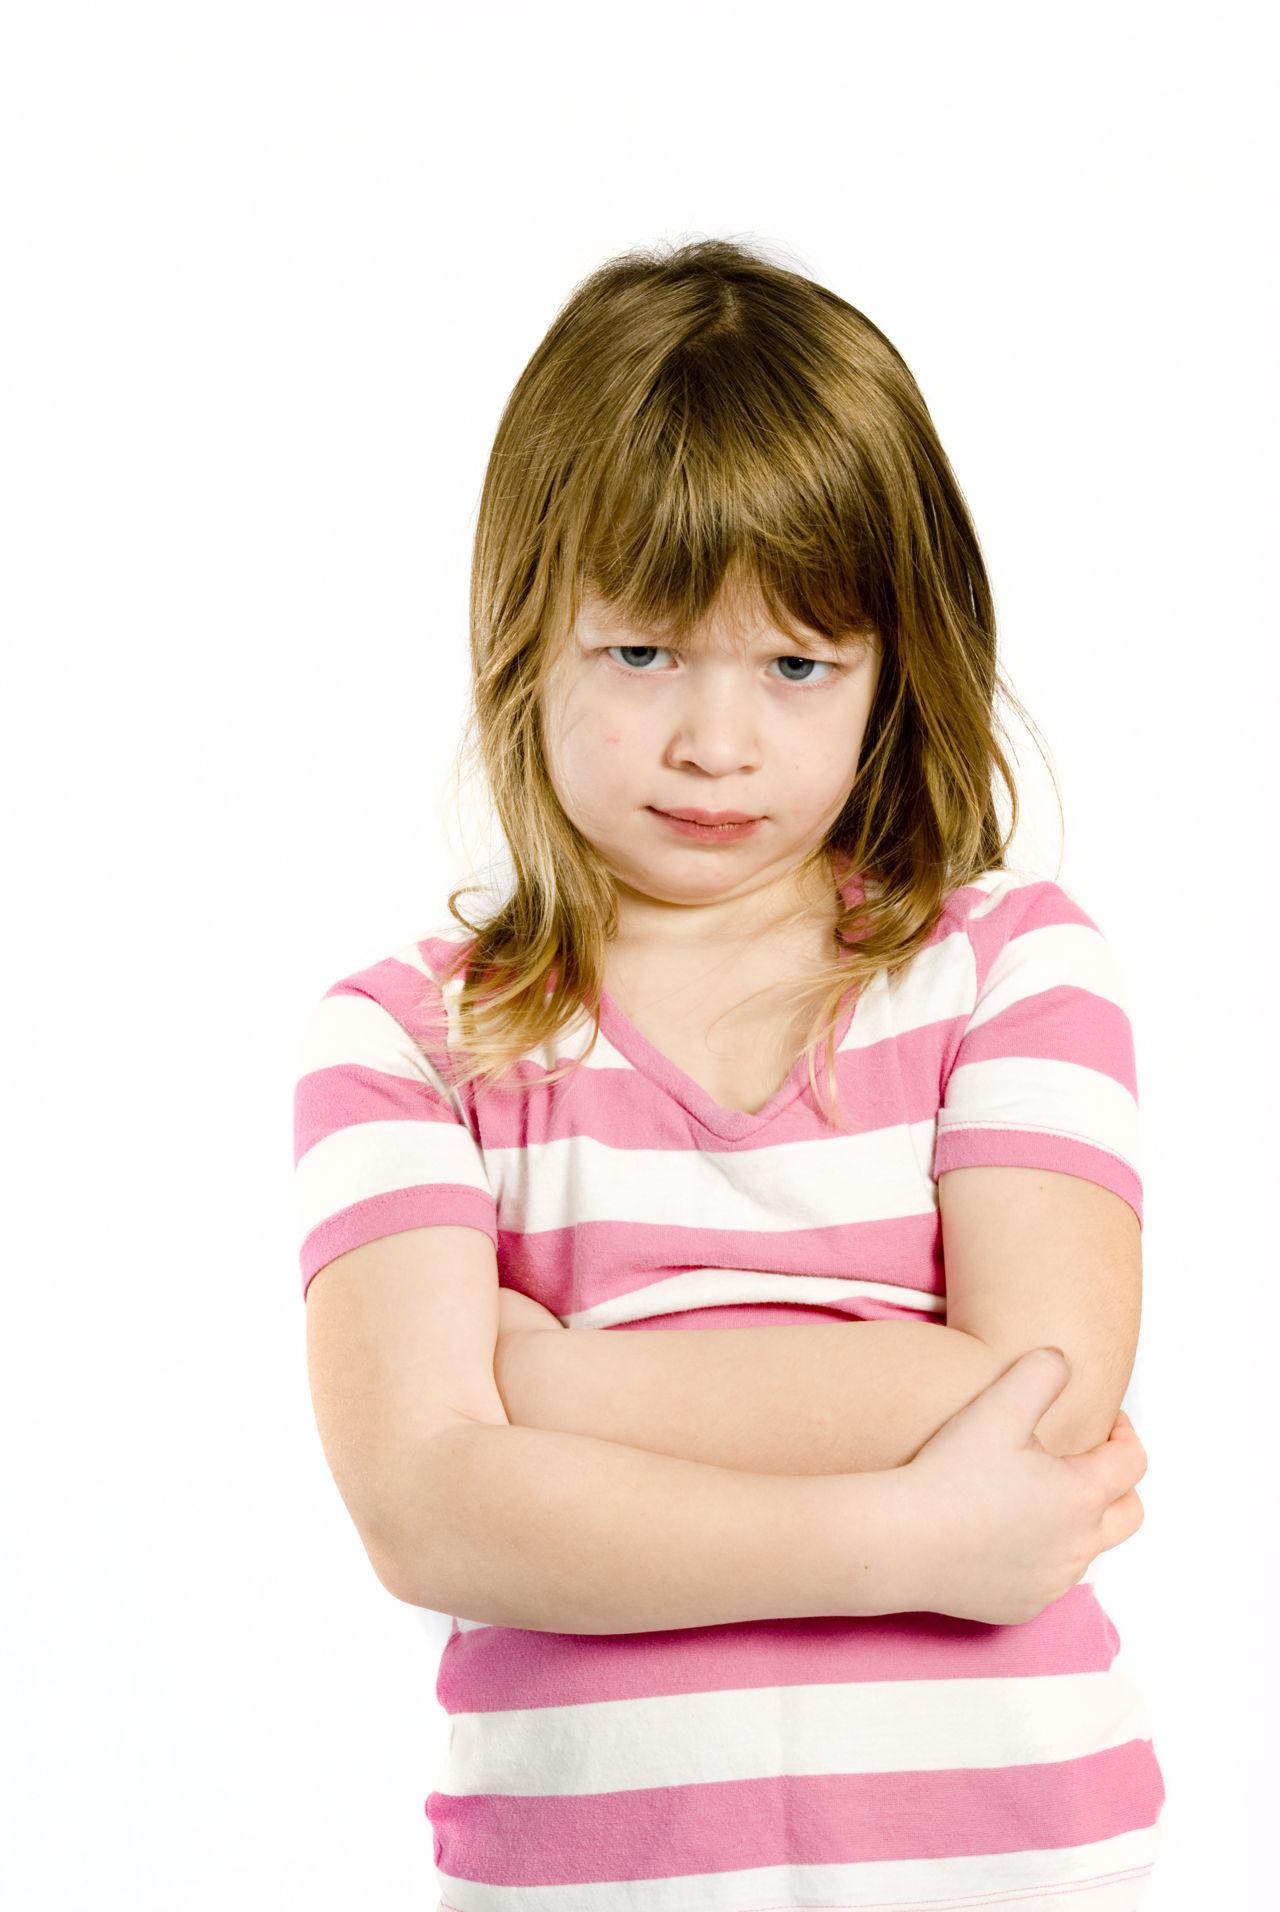 Altitude Sickness in Children